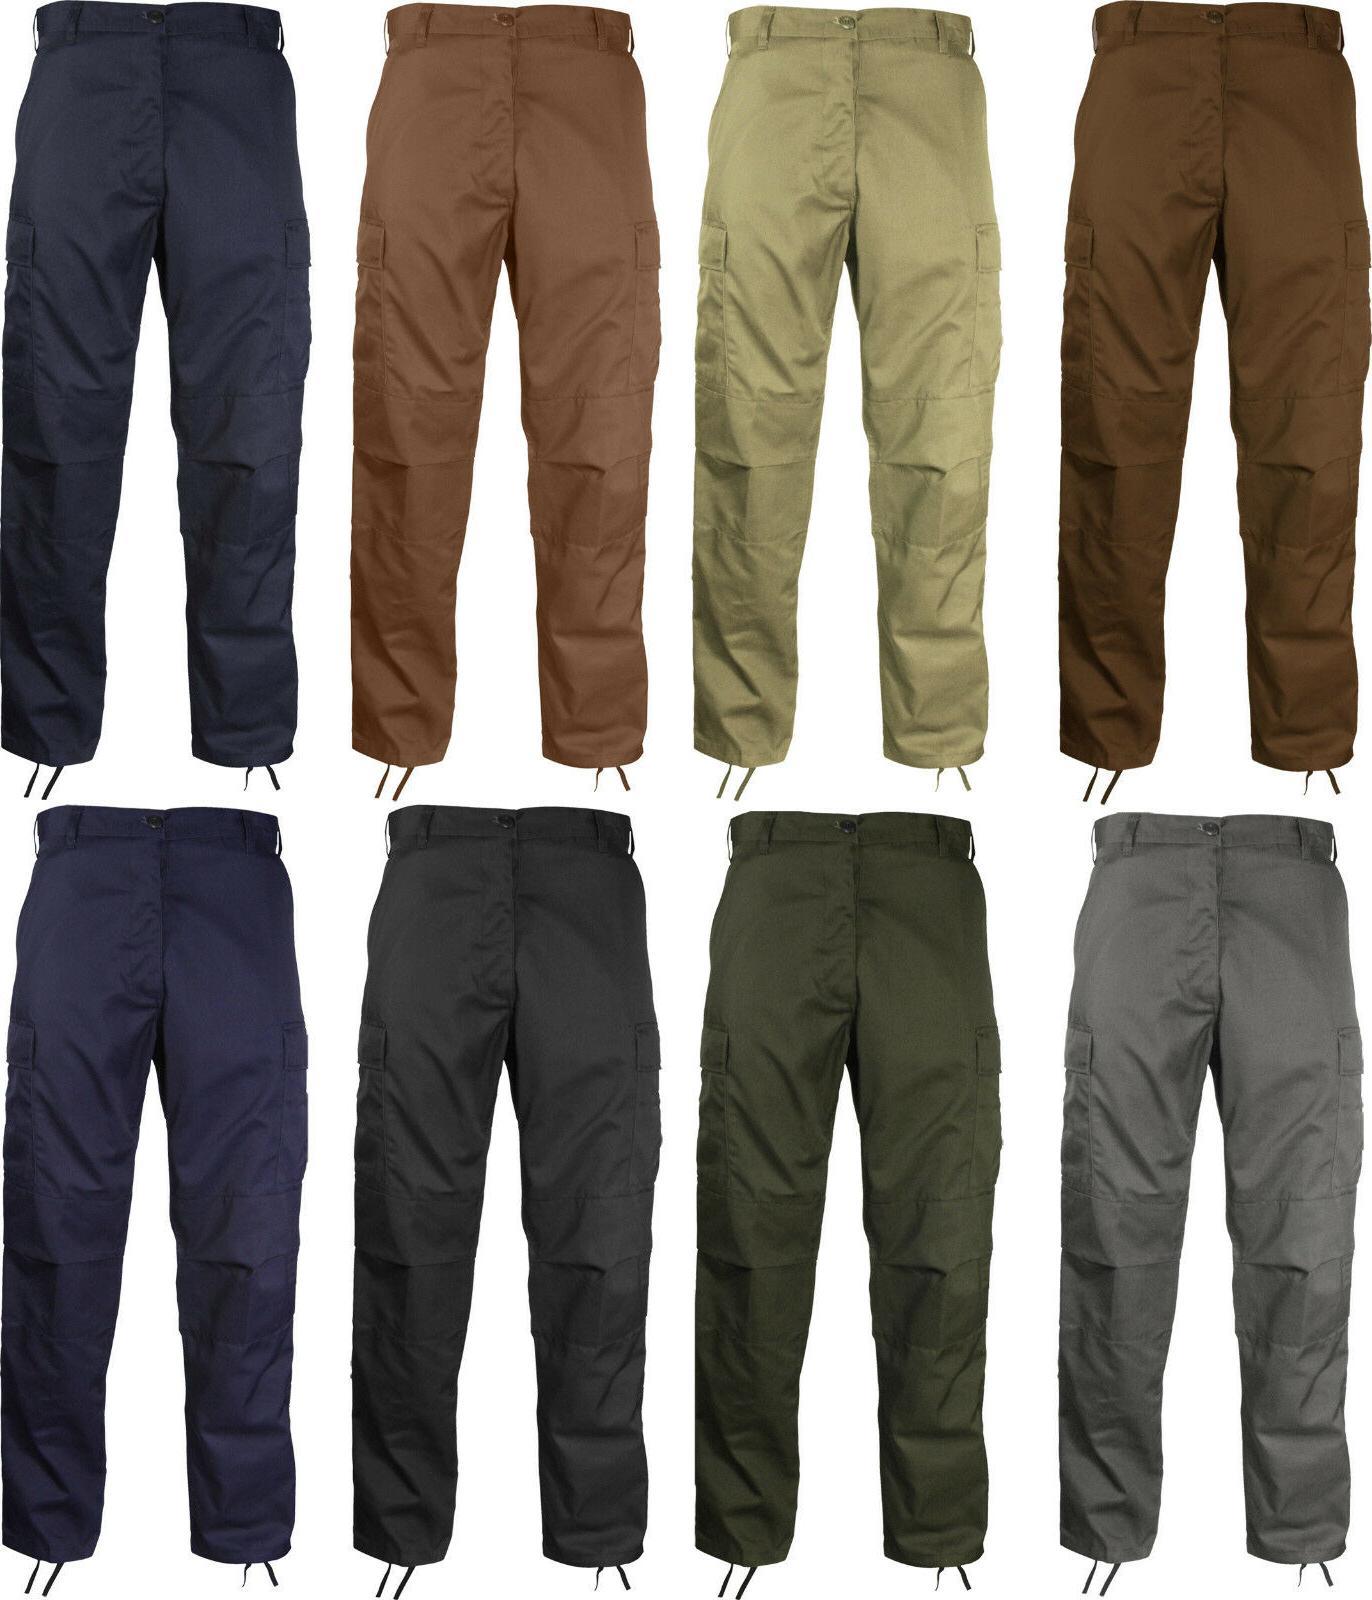 Tactical Military Uniform Trousers Fatigues Pocket